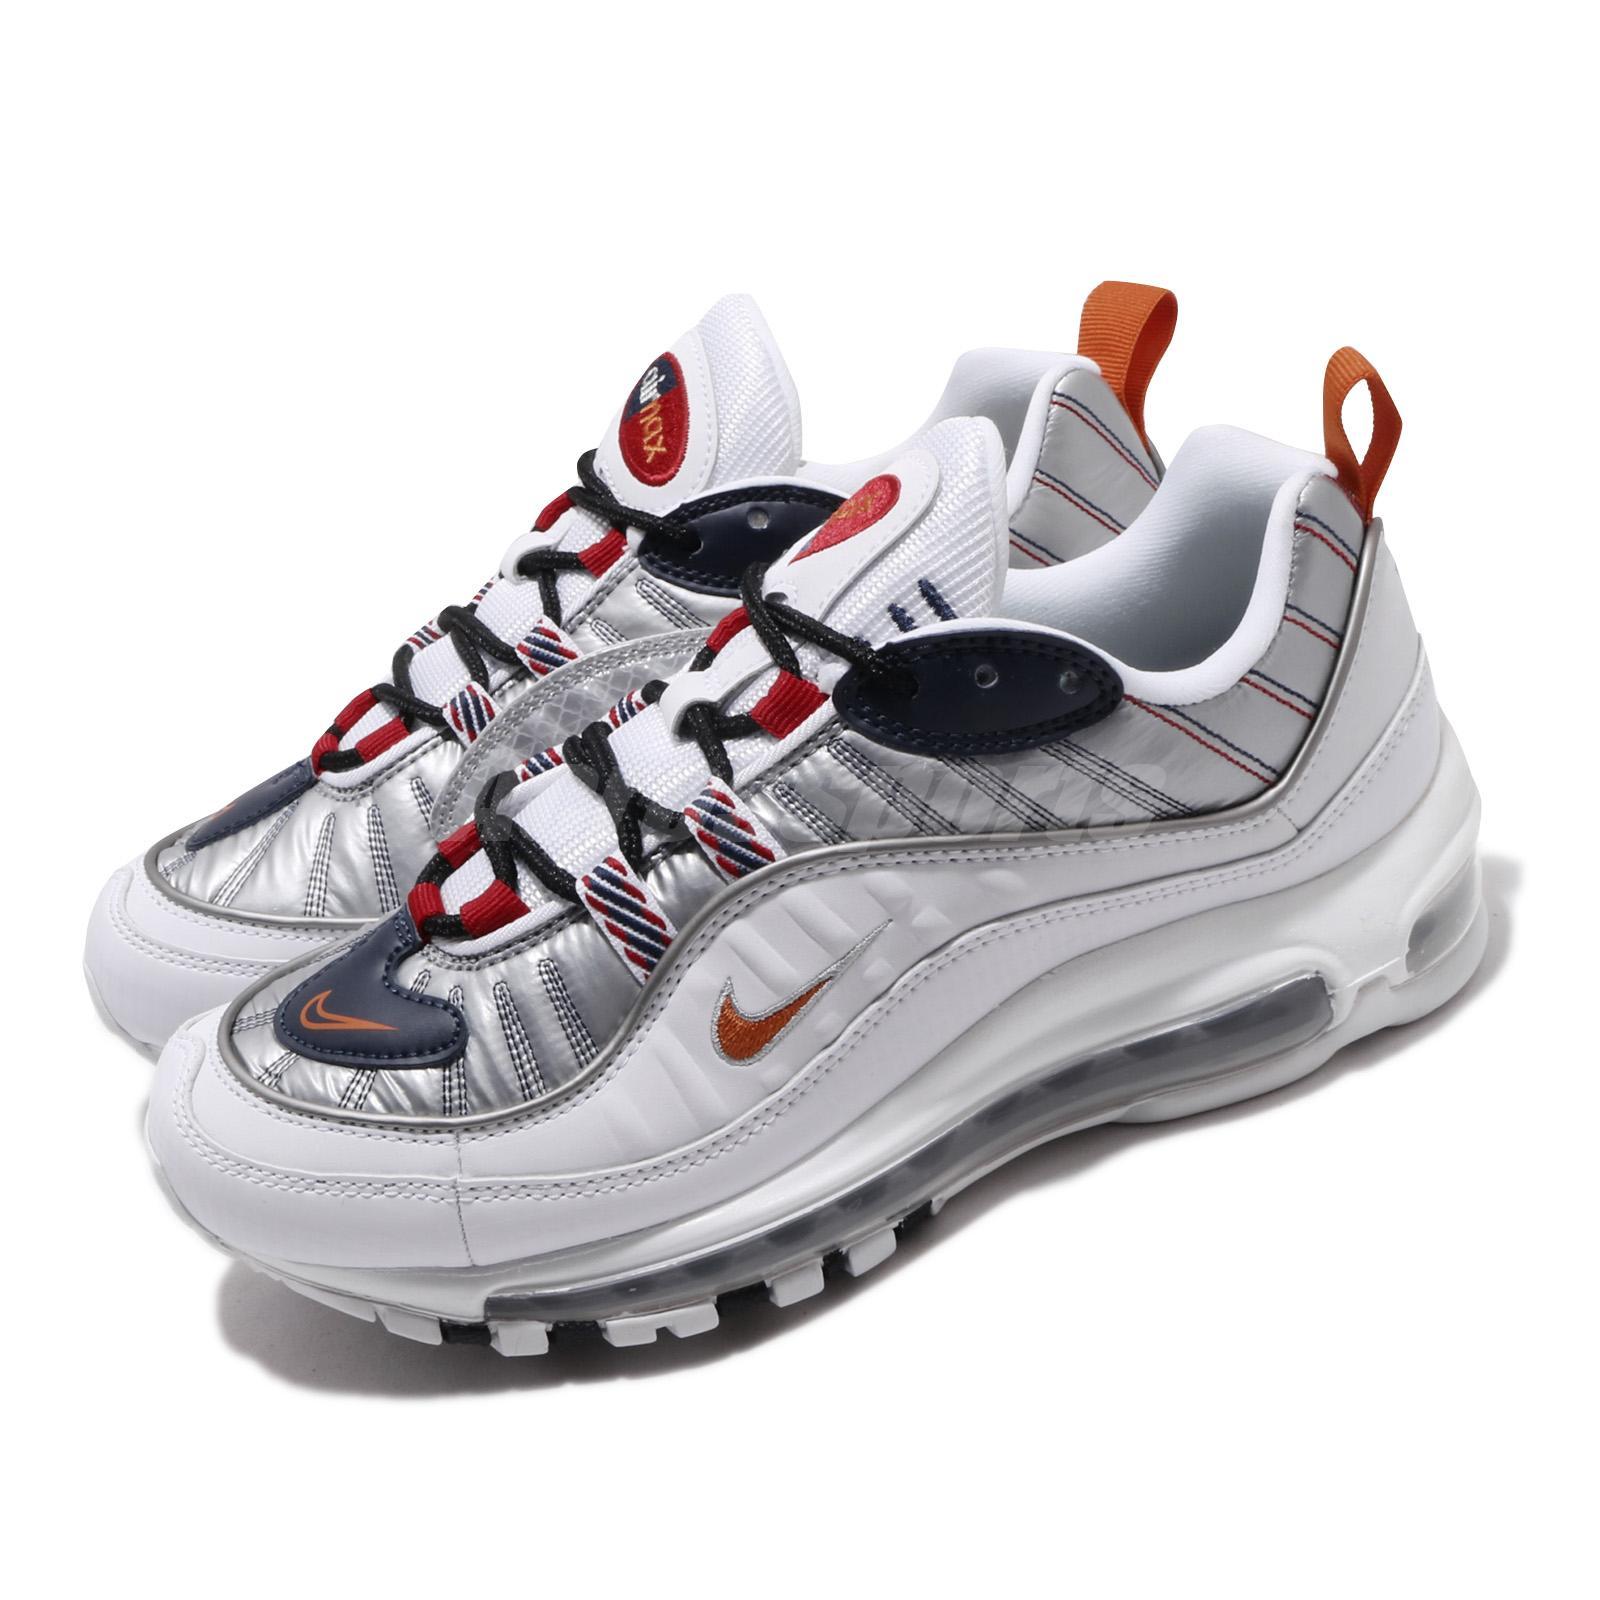 nike air max 98 white/orange/silver